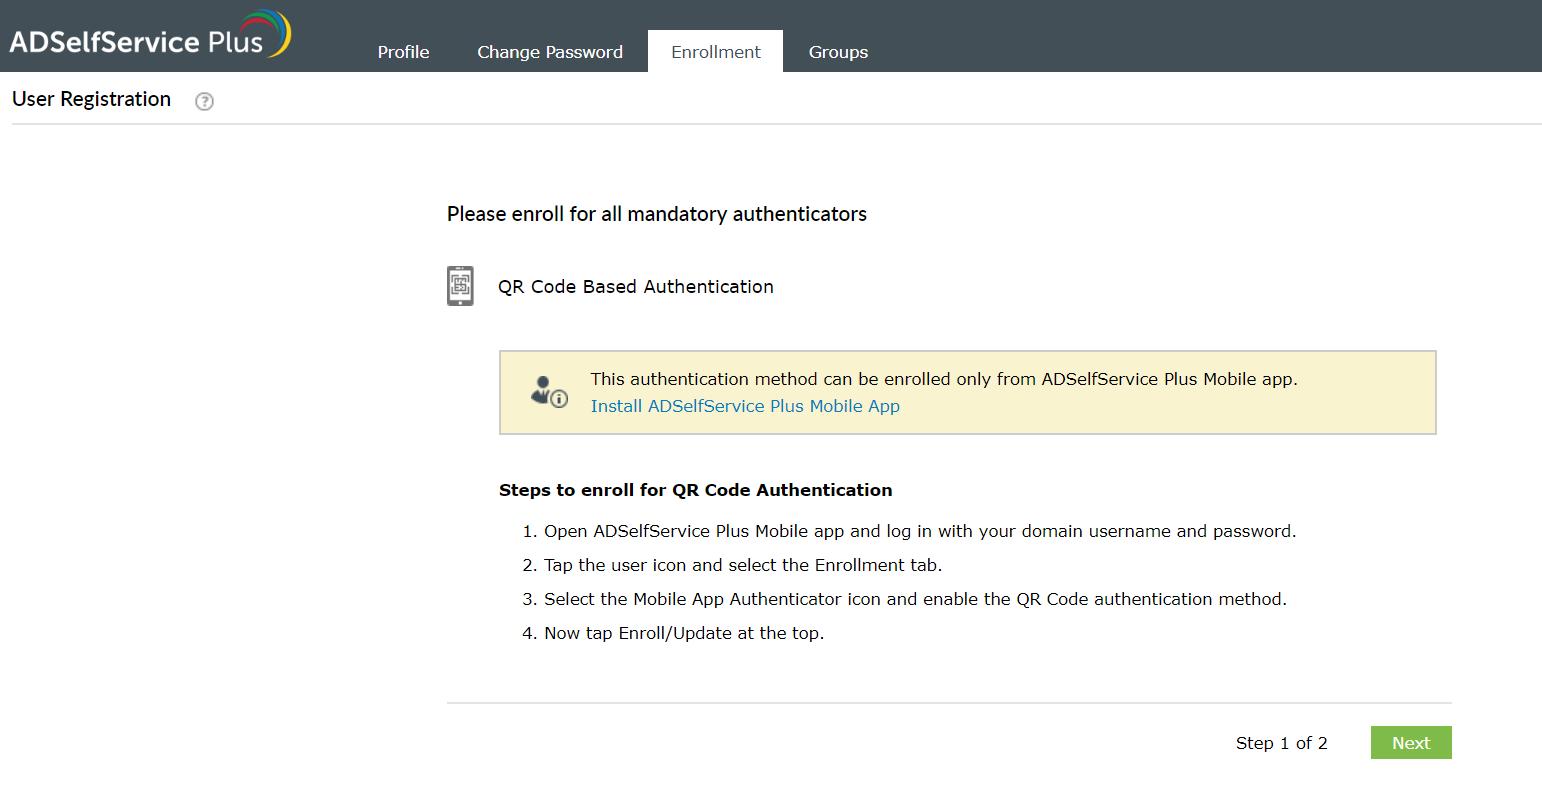 Enrollment using QR code authenticator